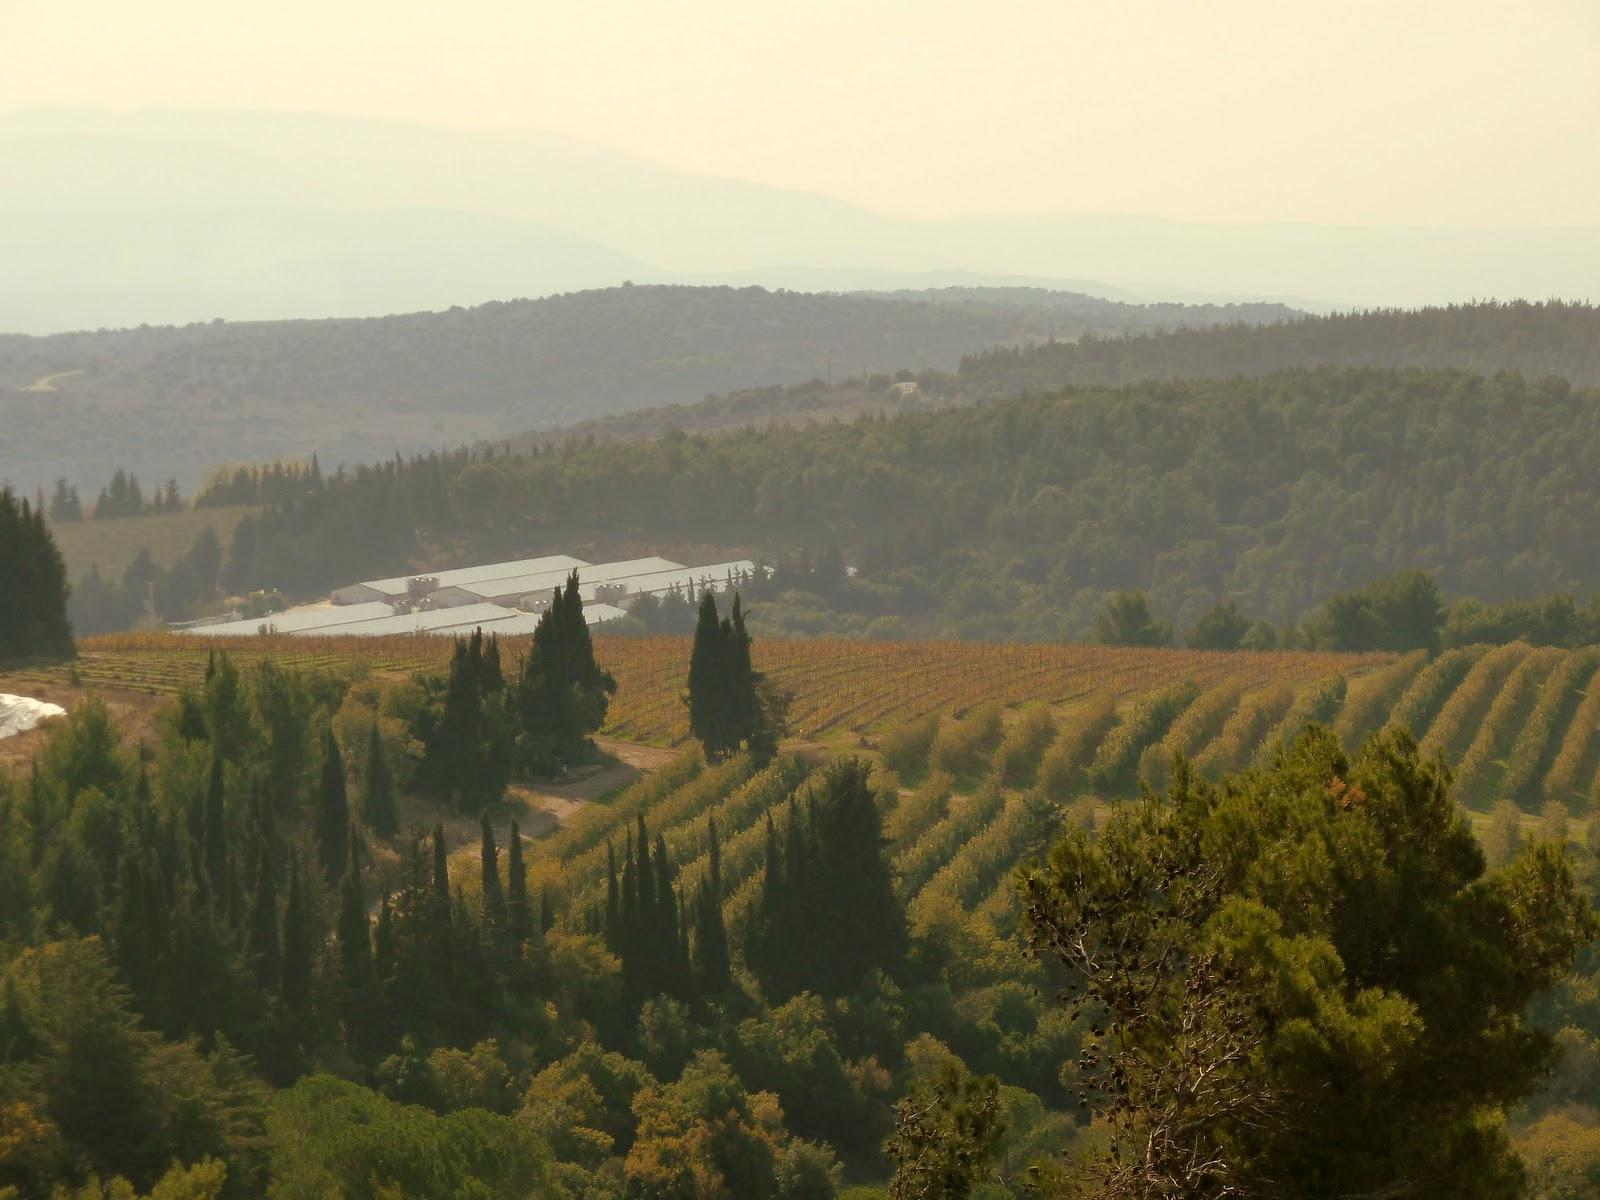 Tuscany in Israel, indeed